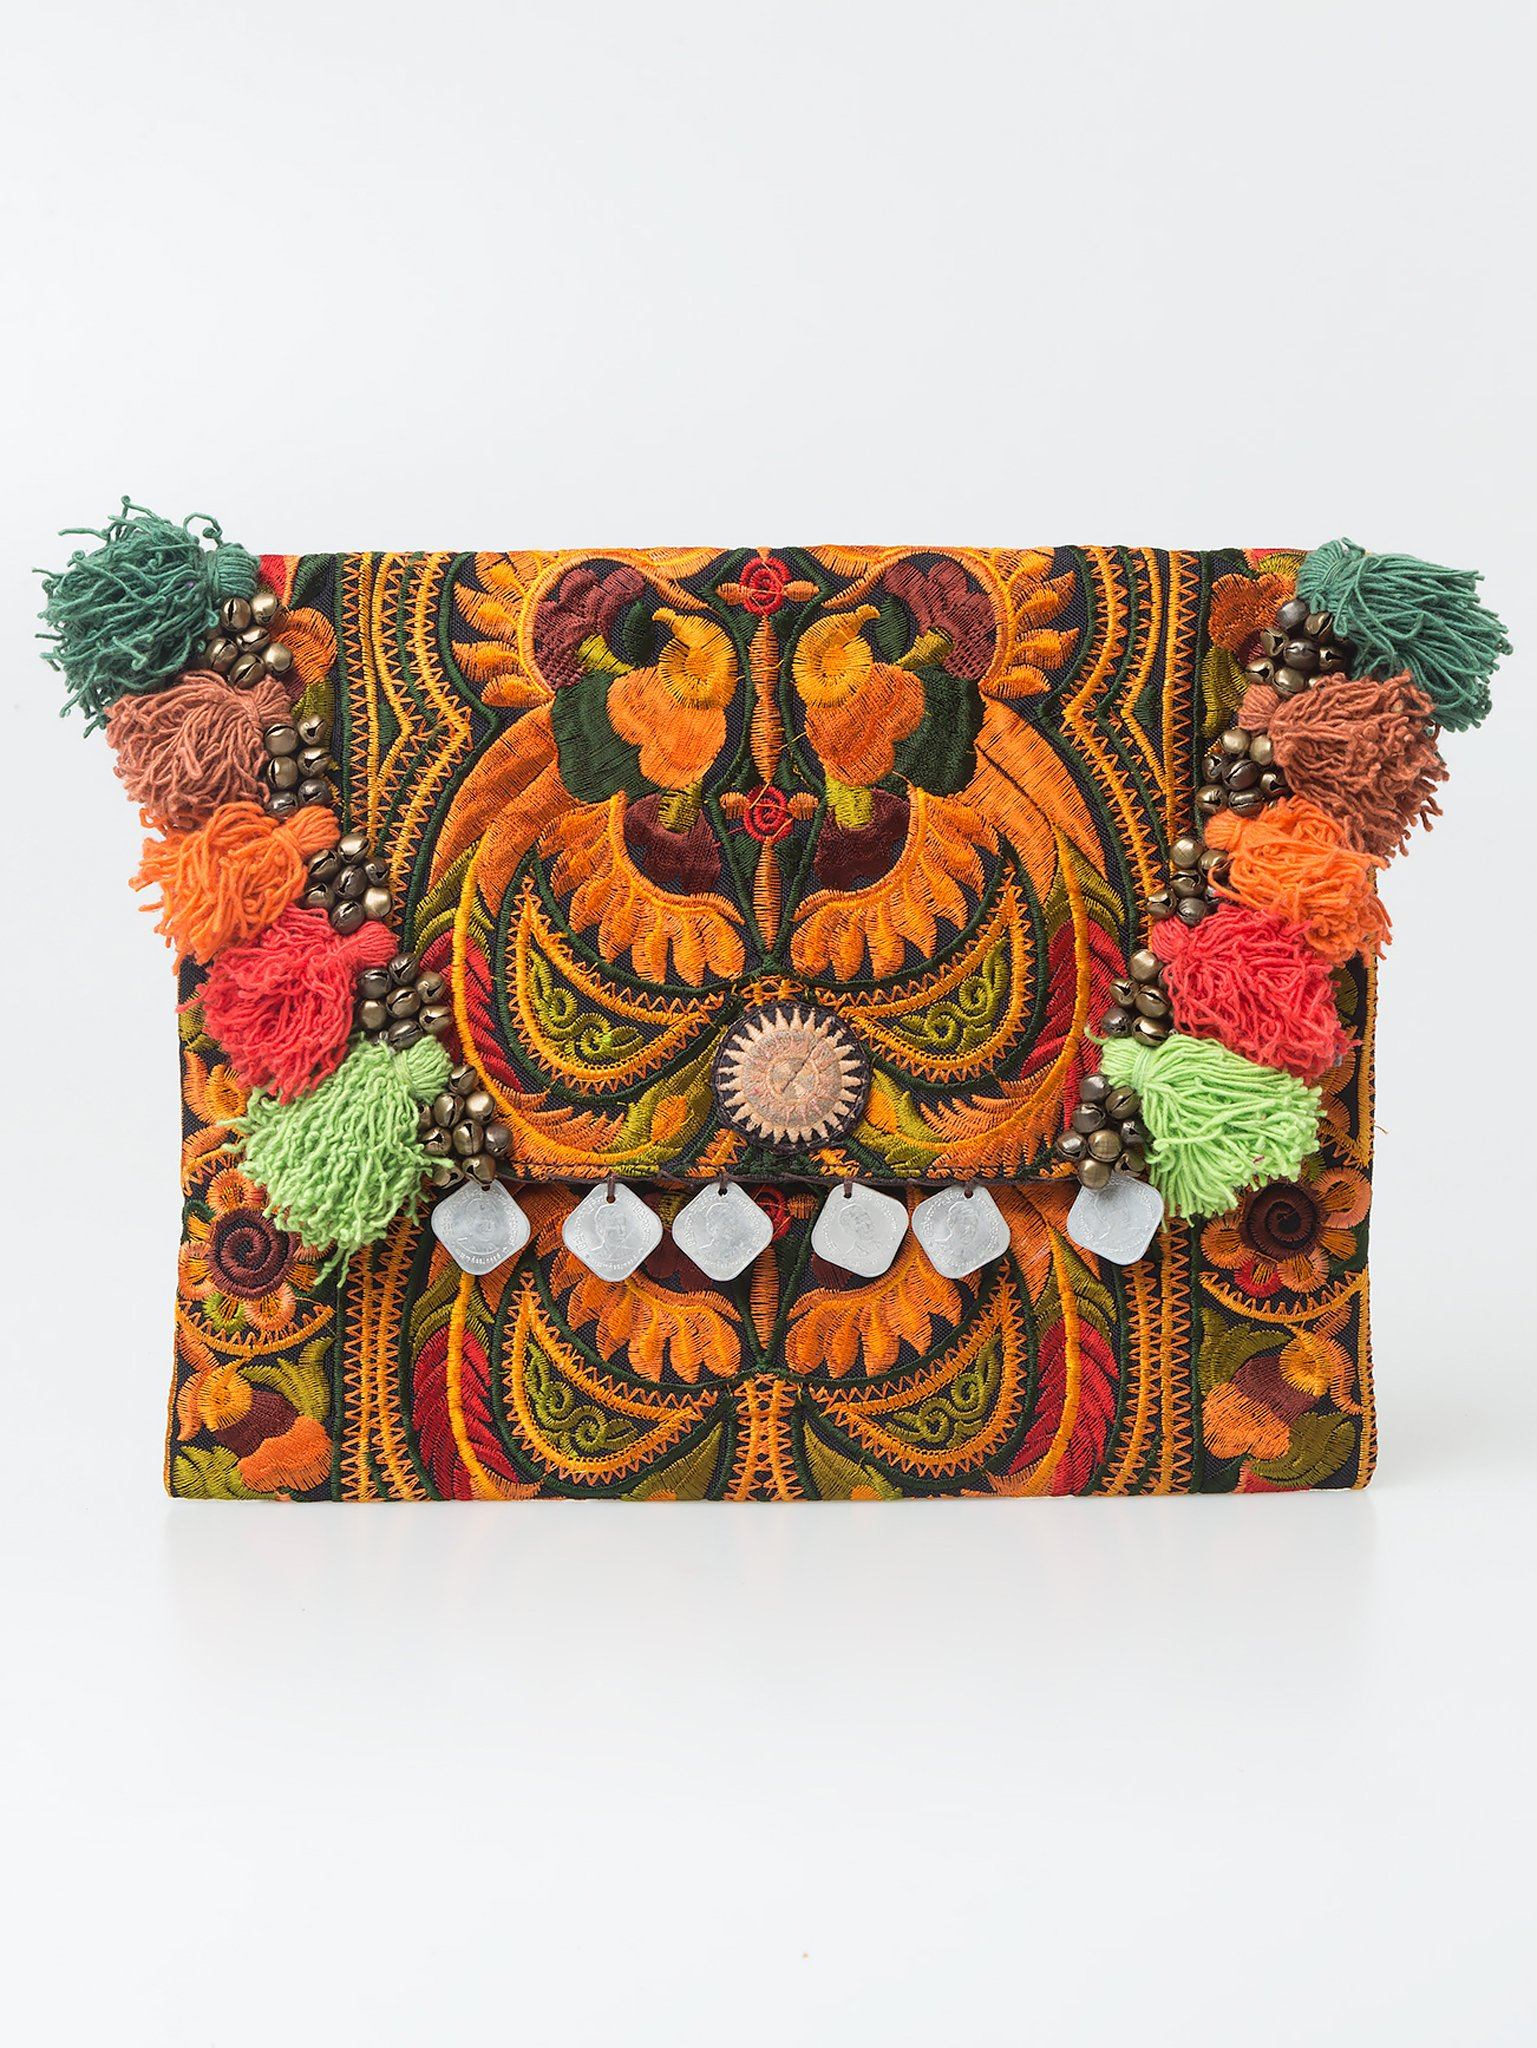 Changnoi Orange Bird Boho Clutch Hmong Embroidered Handmade Fair Trade Thailand